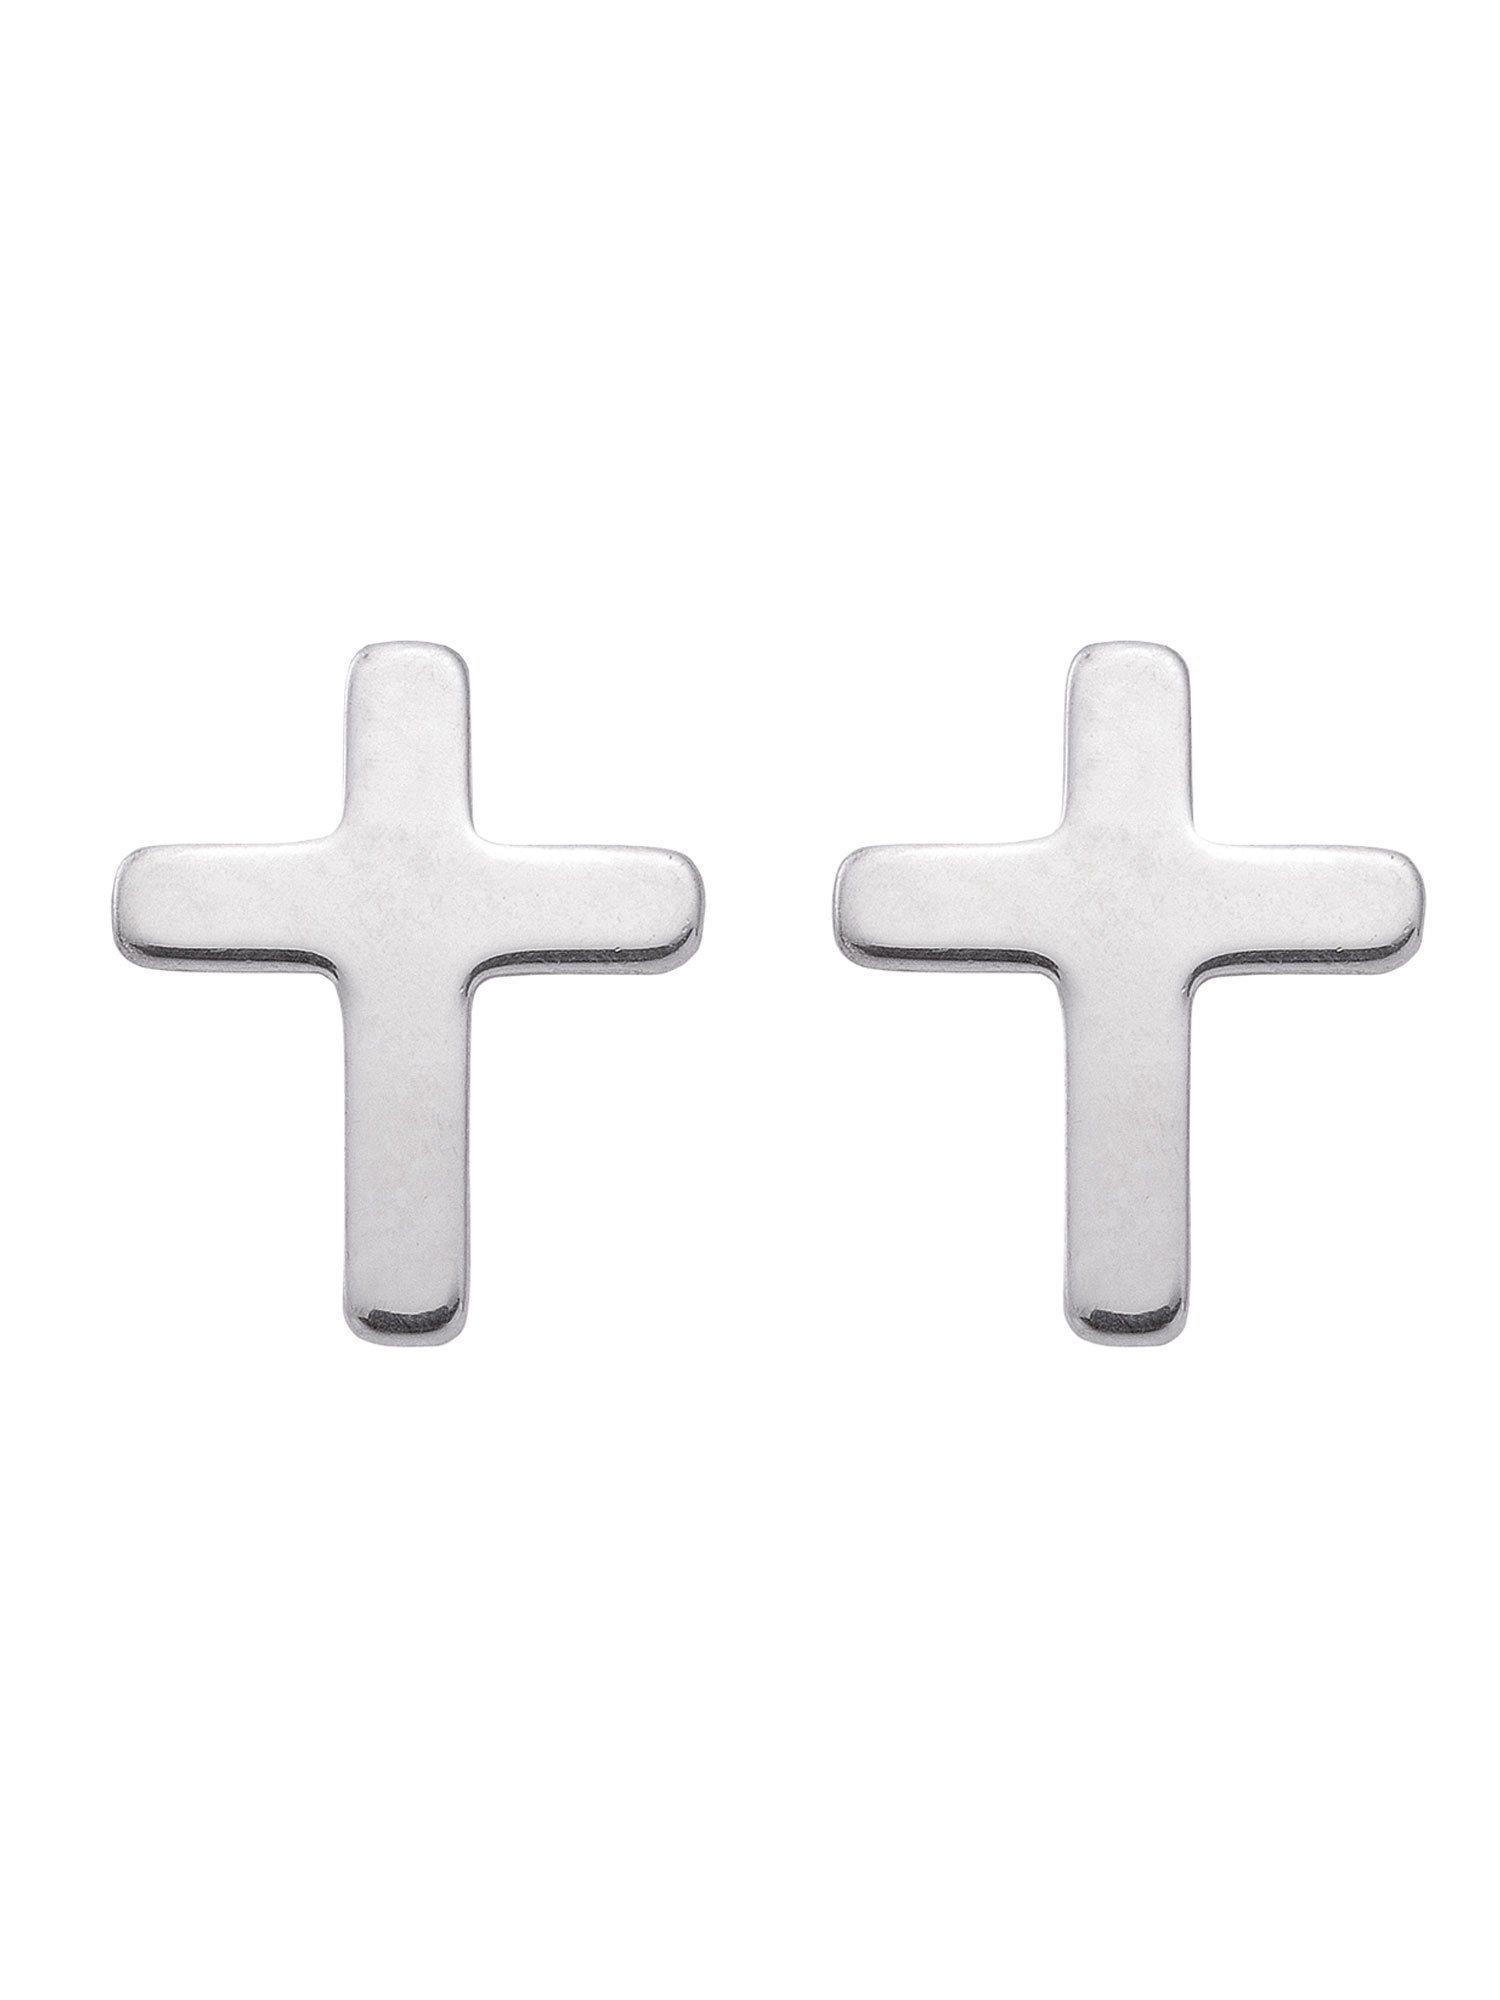 Adelia´s Paar Ohrstecker »Silber Ohrringe« Kreuz 925 Sterling Silber | Schmuck > Ohrschmuck & Ohrringe > Ohrstecker | Silber | Adelia´s